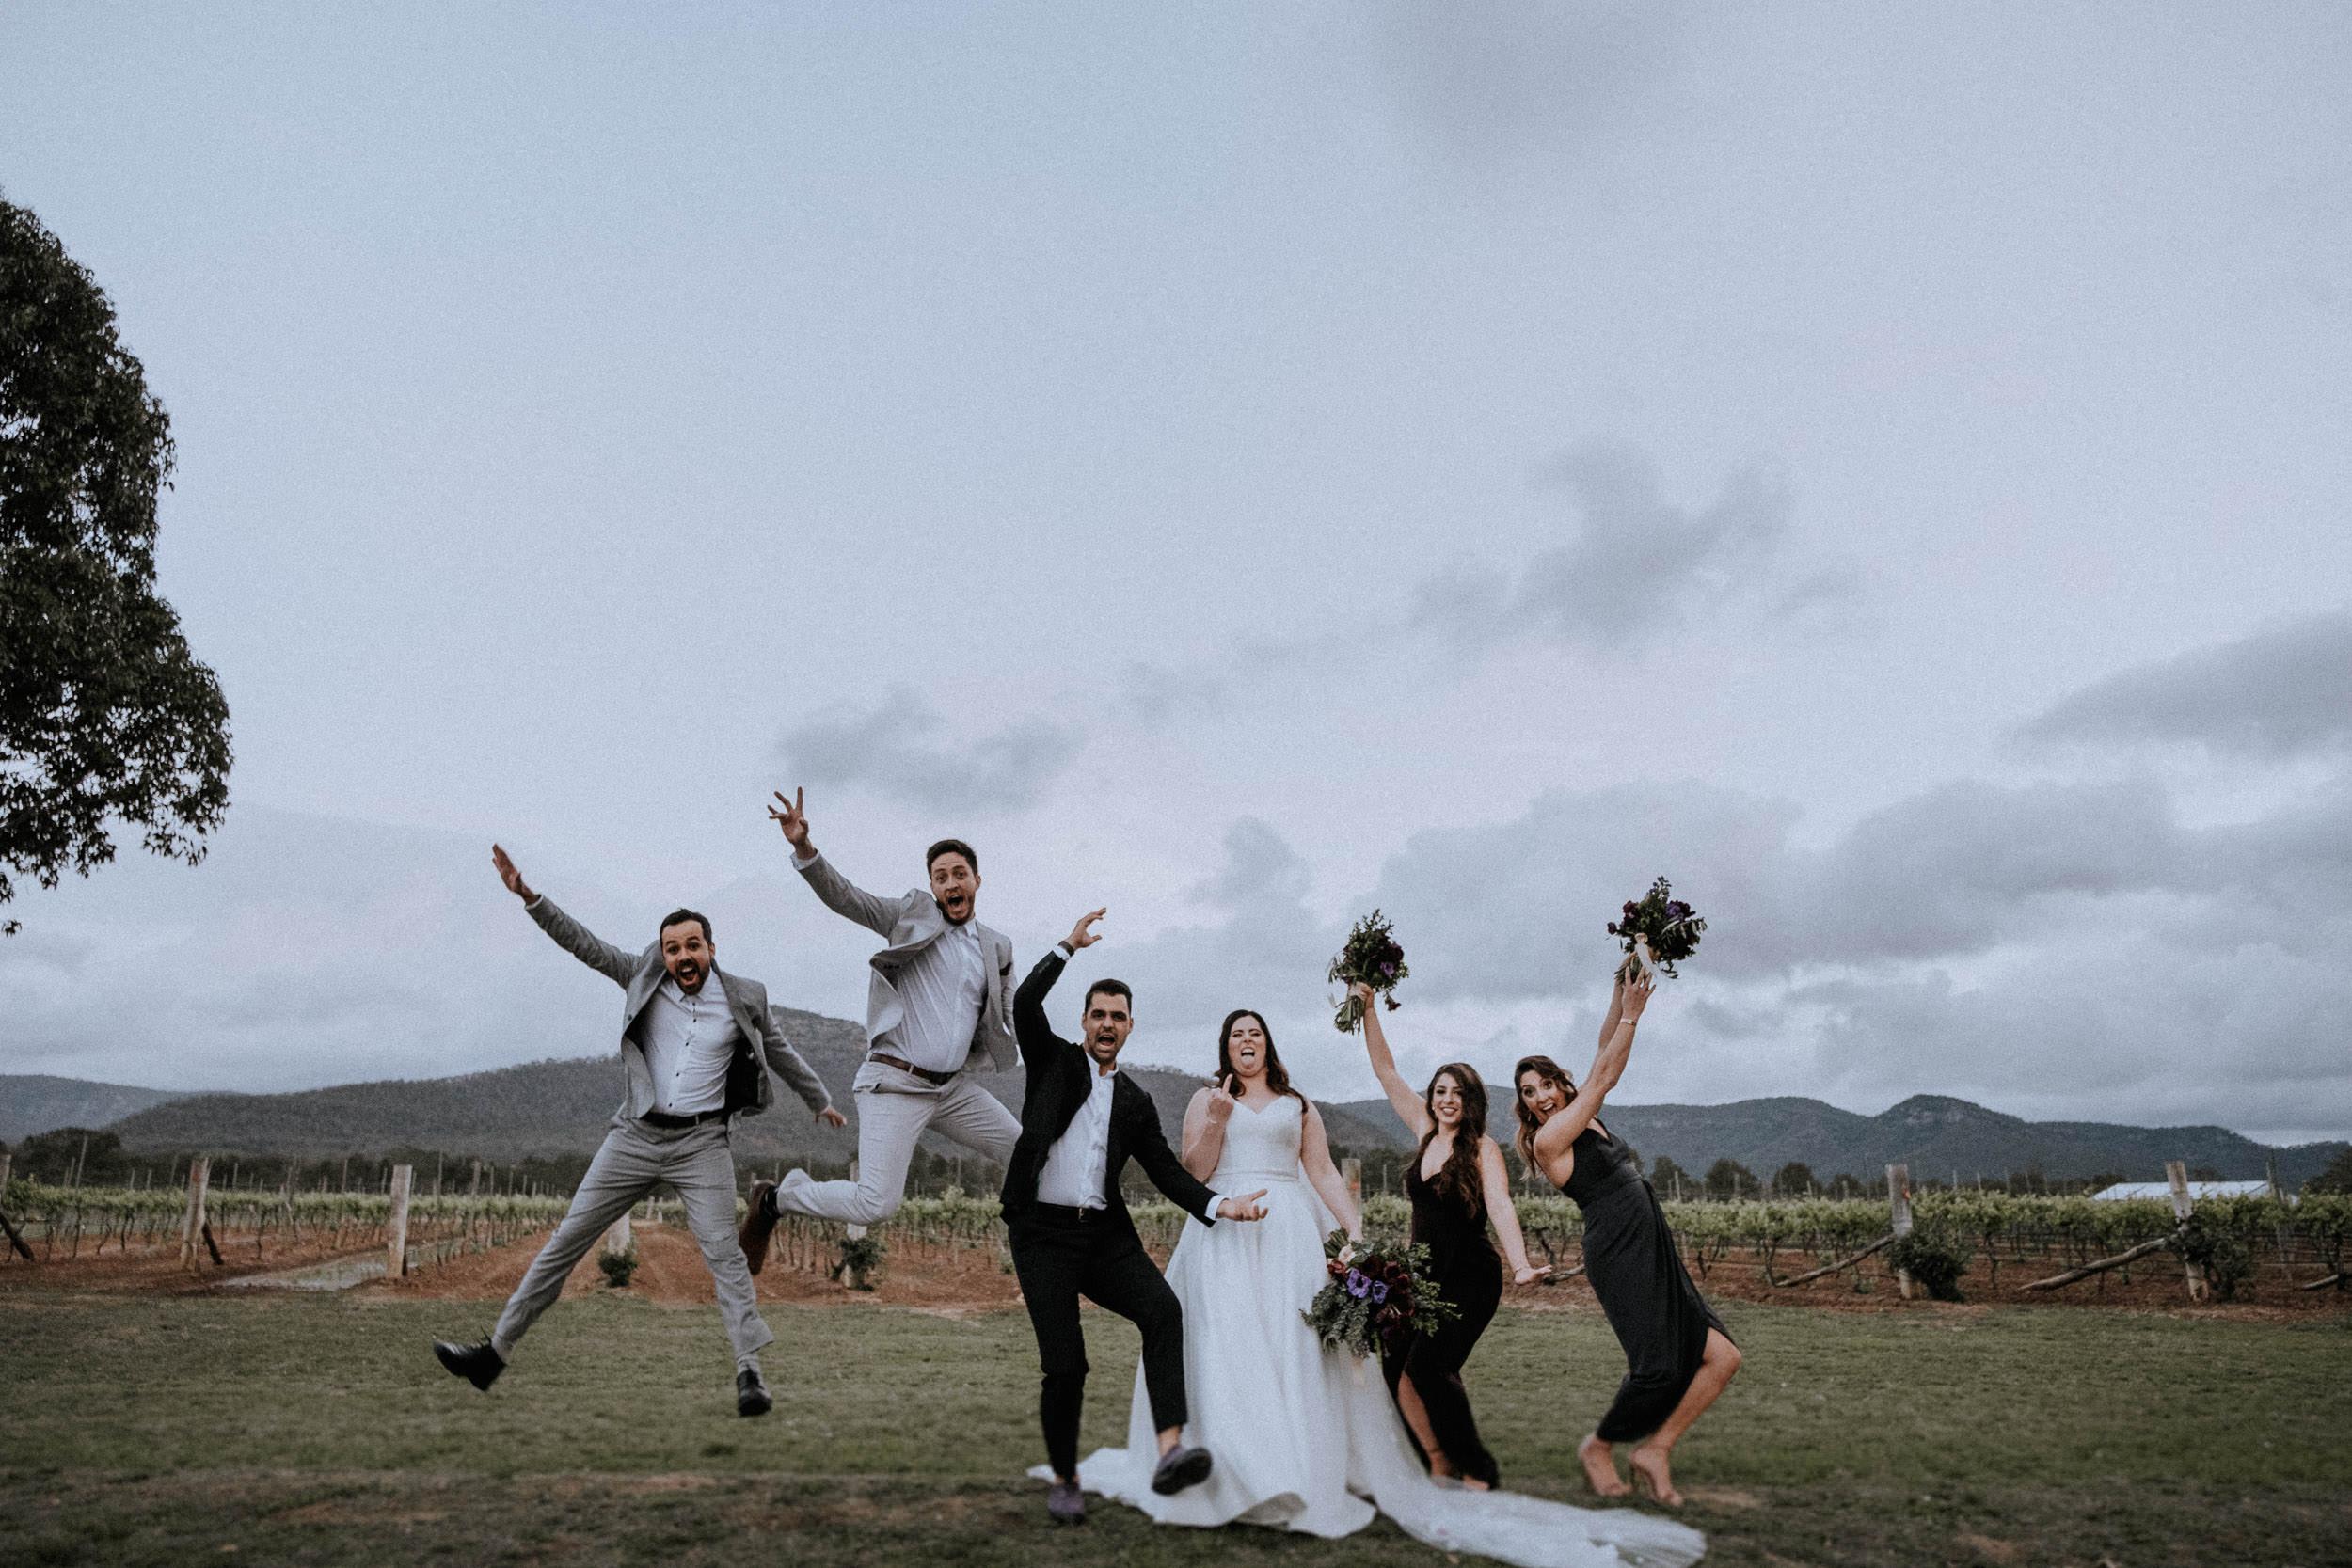 s+j_top_elopement wedding photography_kings & thieves_blog - 455.jpg